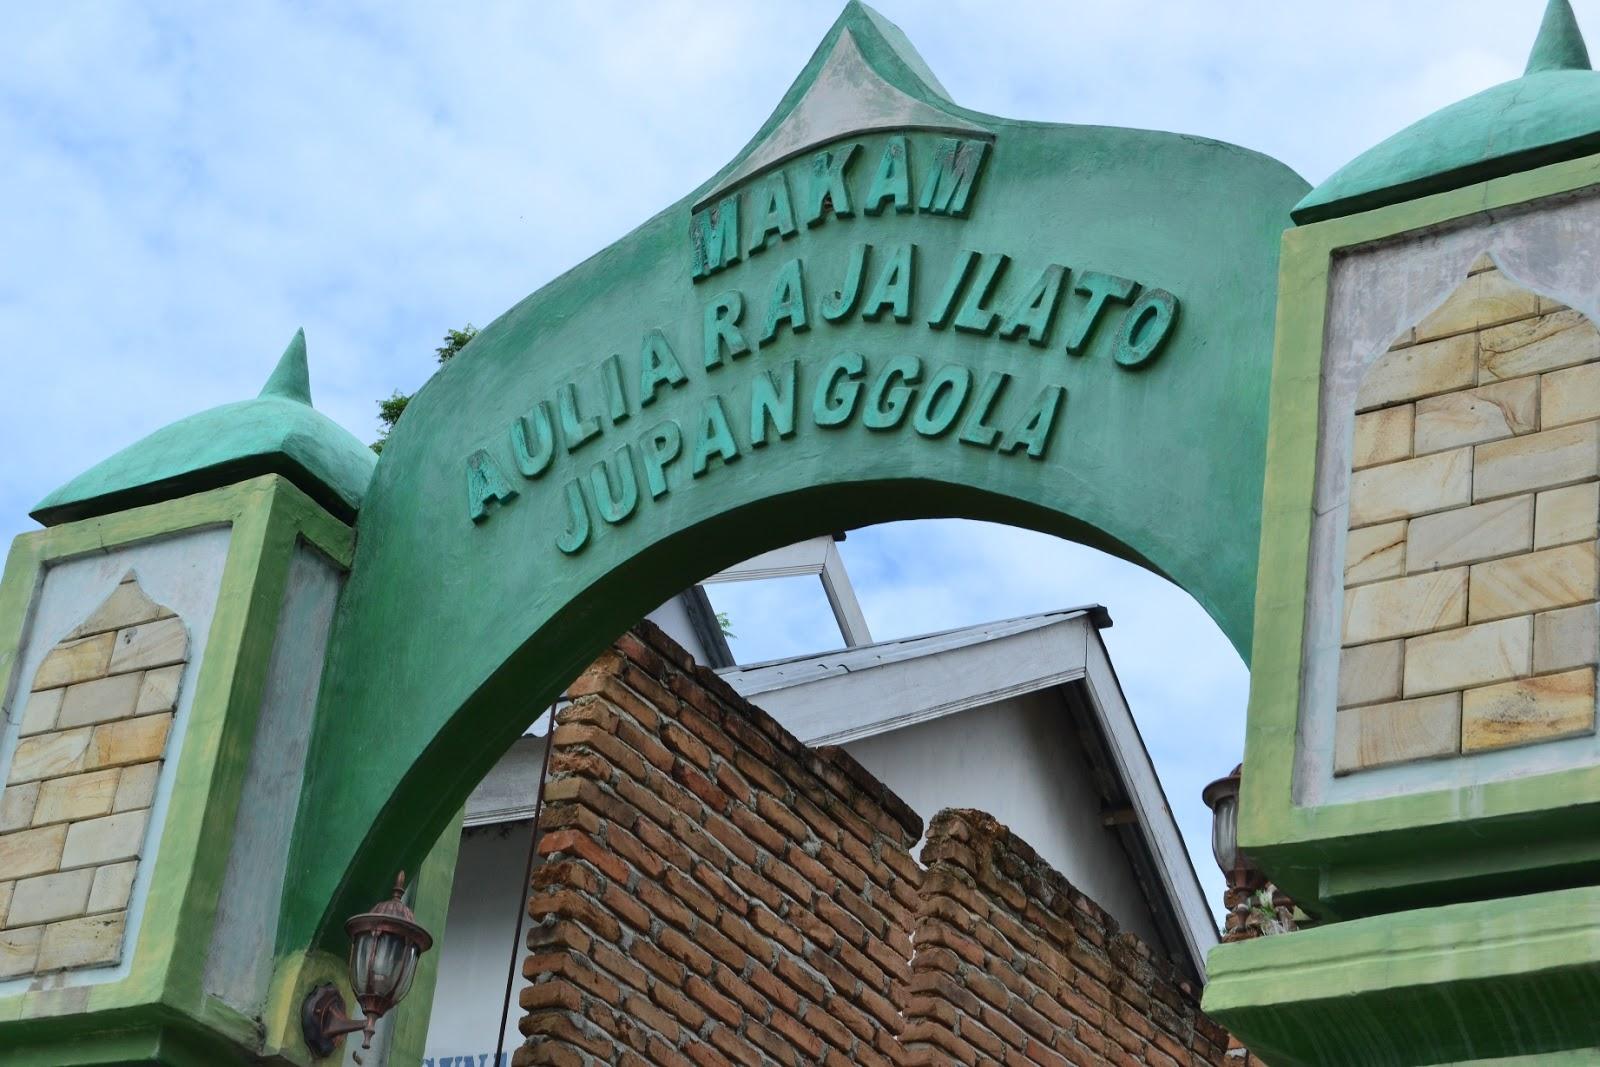 the sanctuary of ju panggola was built behind the mihrab of Masjid Quba